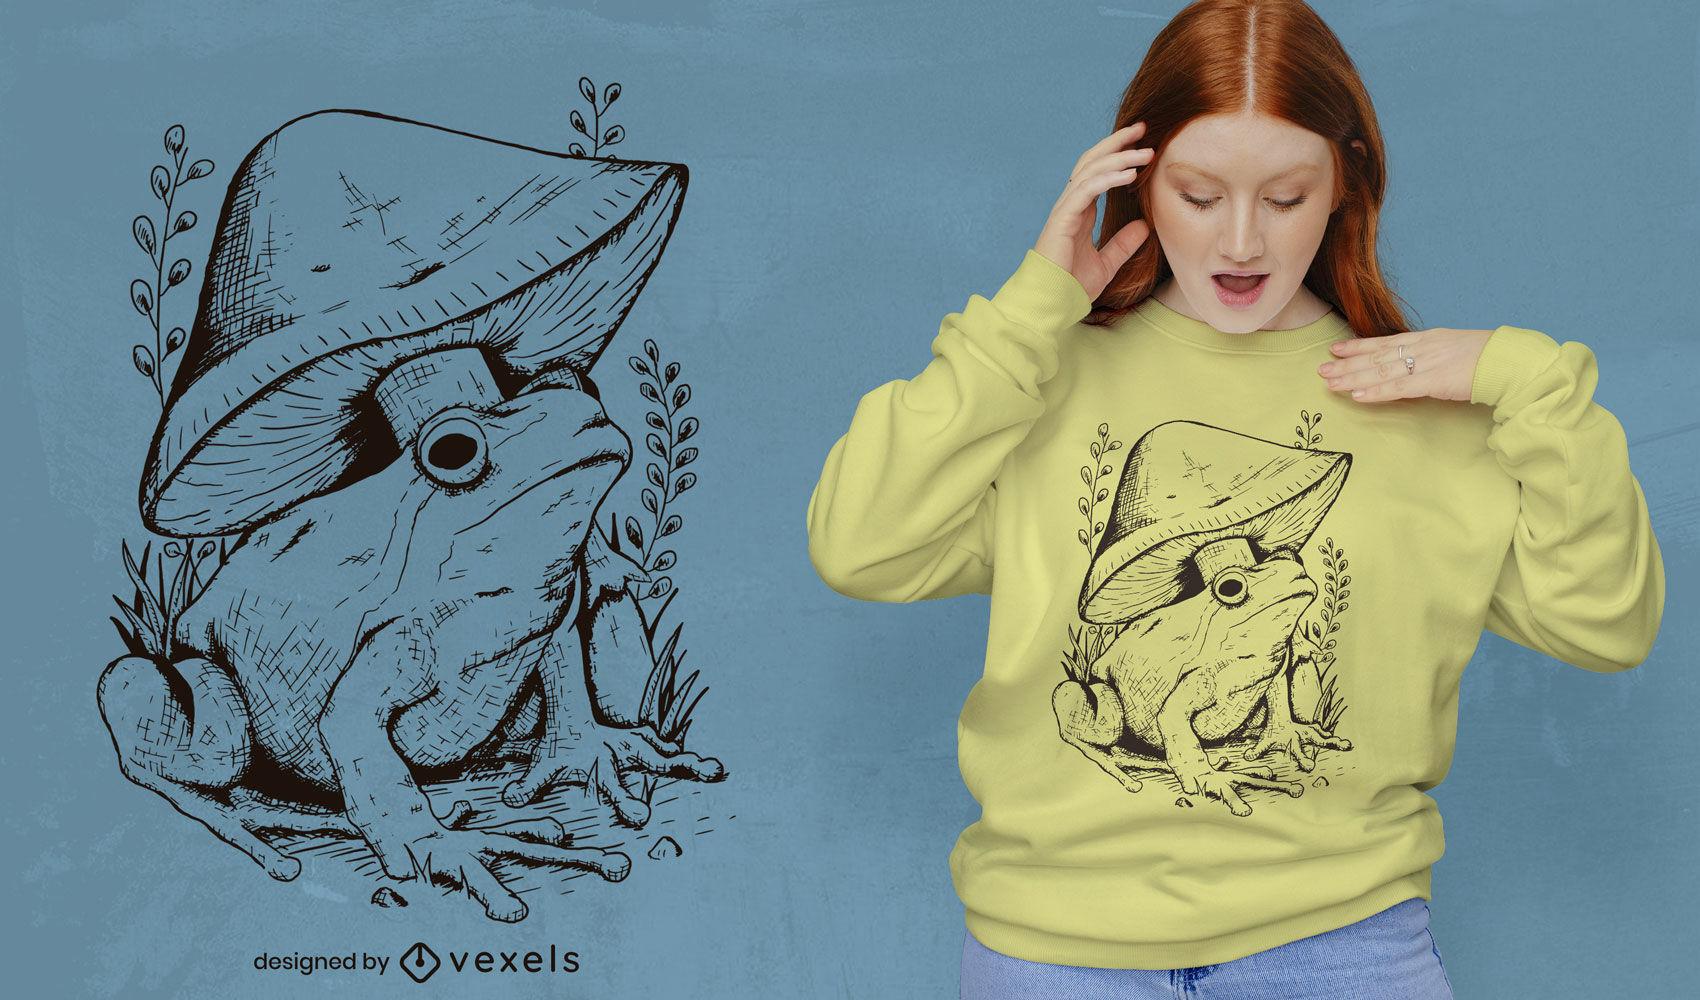 Frog and mushroom line art t-shirt design